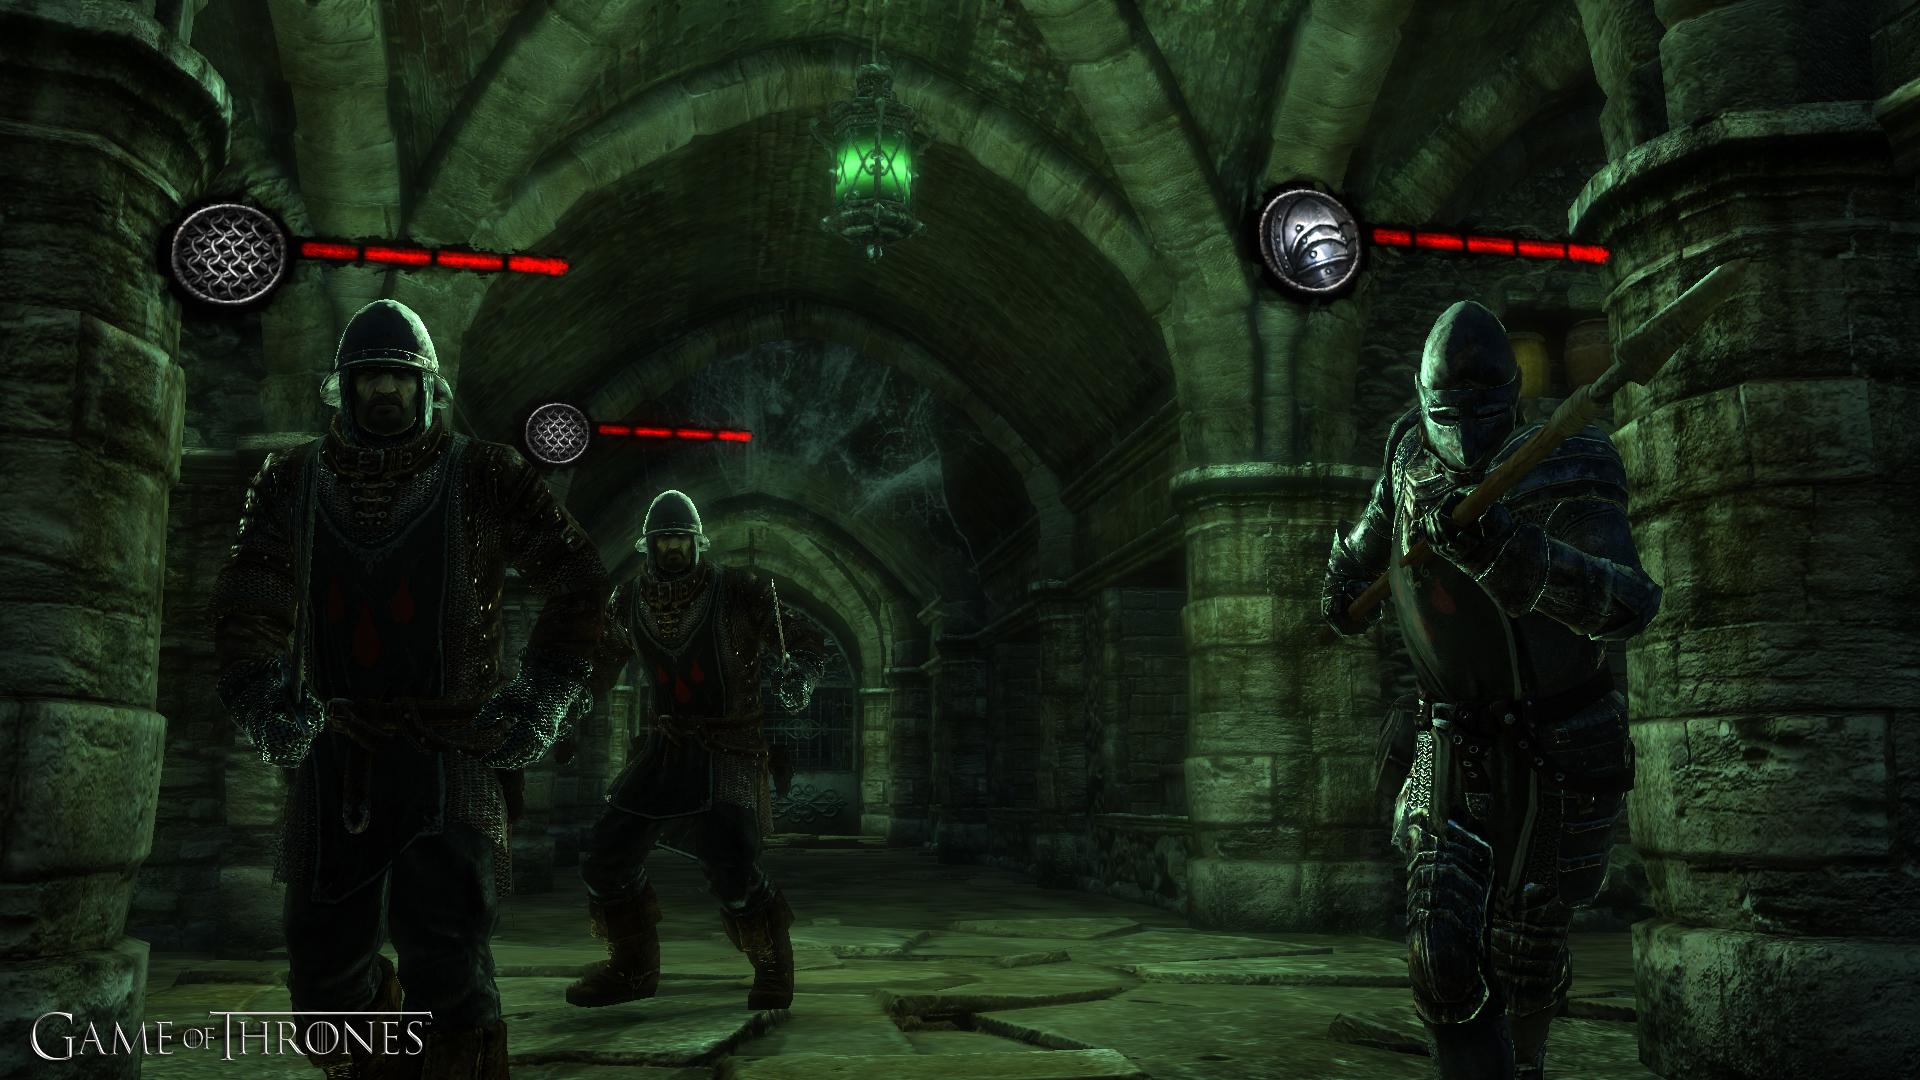 game_of_thrones-13.jpg